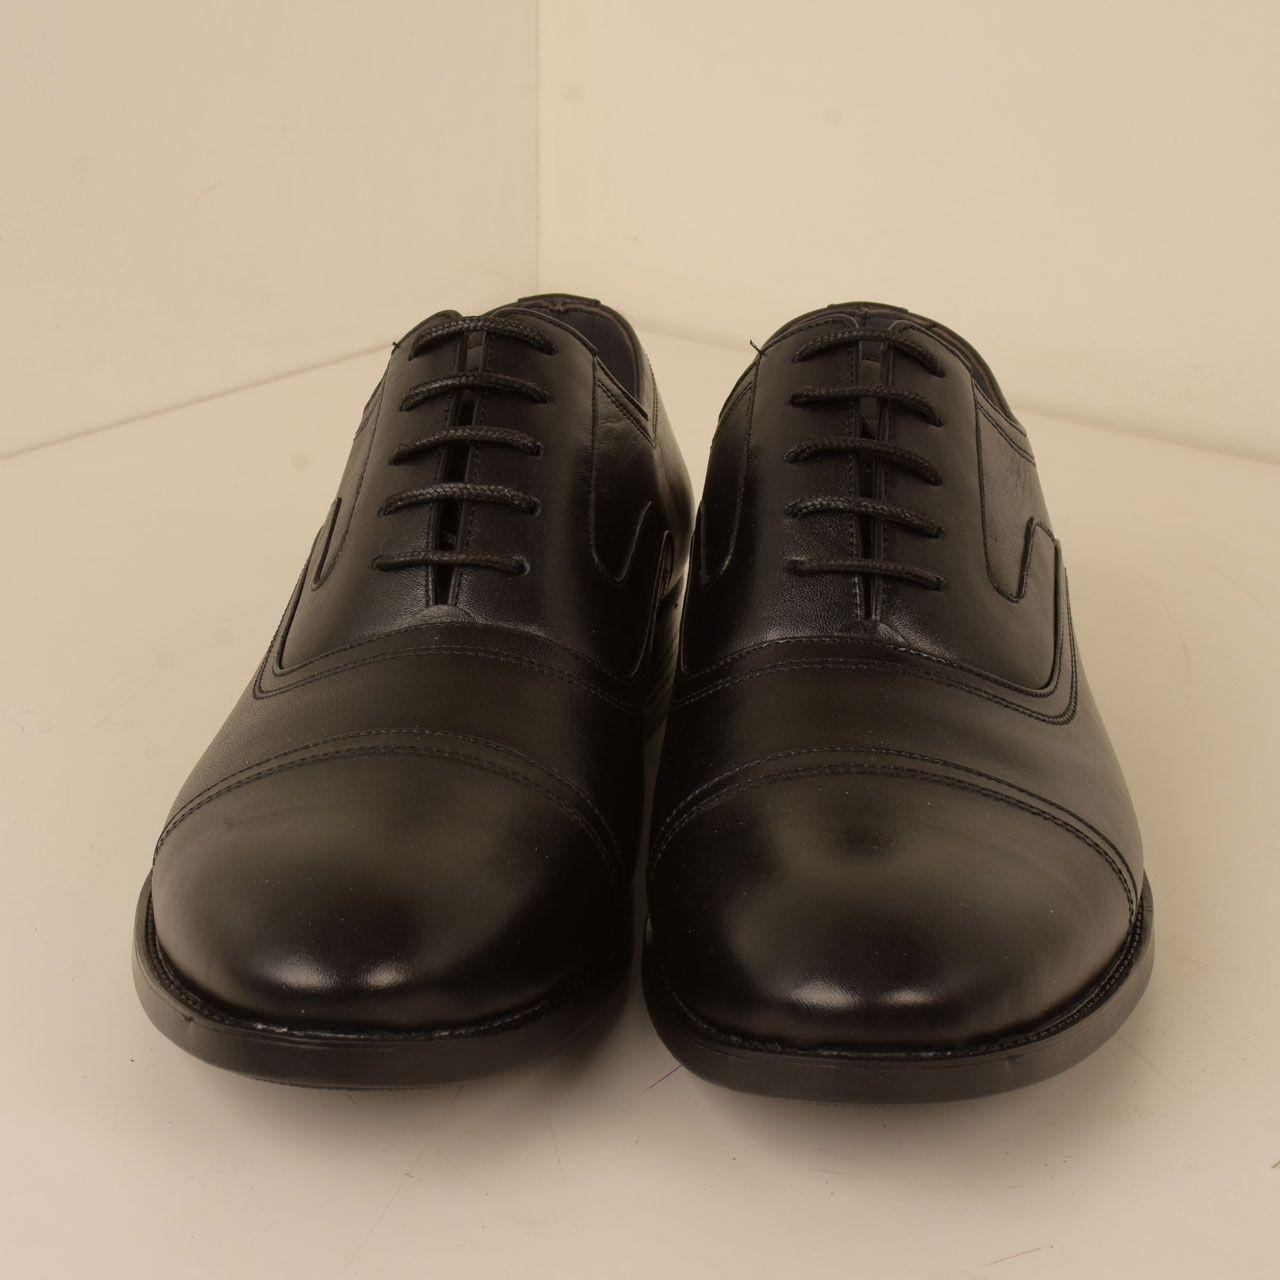 کفش مردانه پارینه چرم مدل SHO178 -  - 4